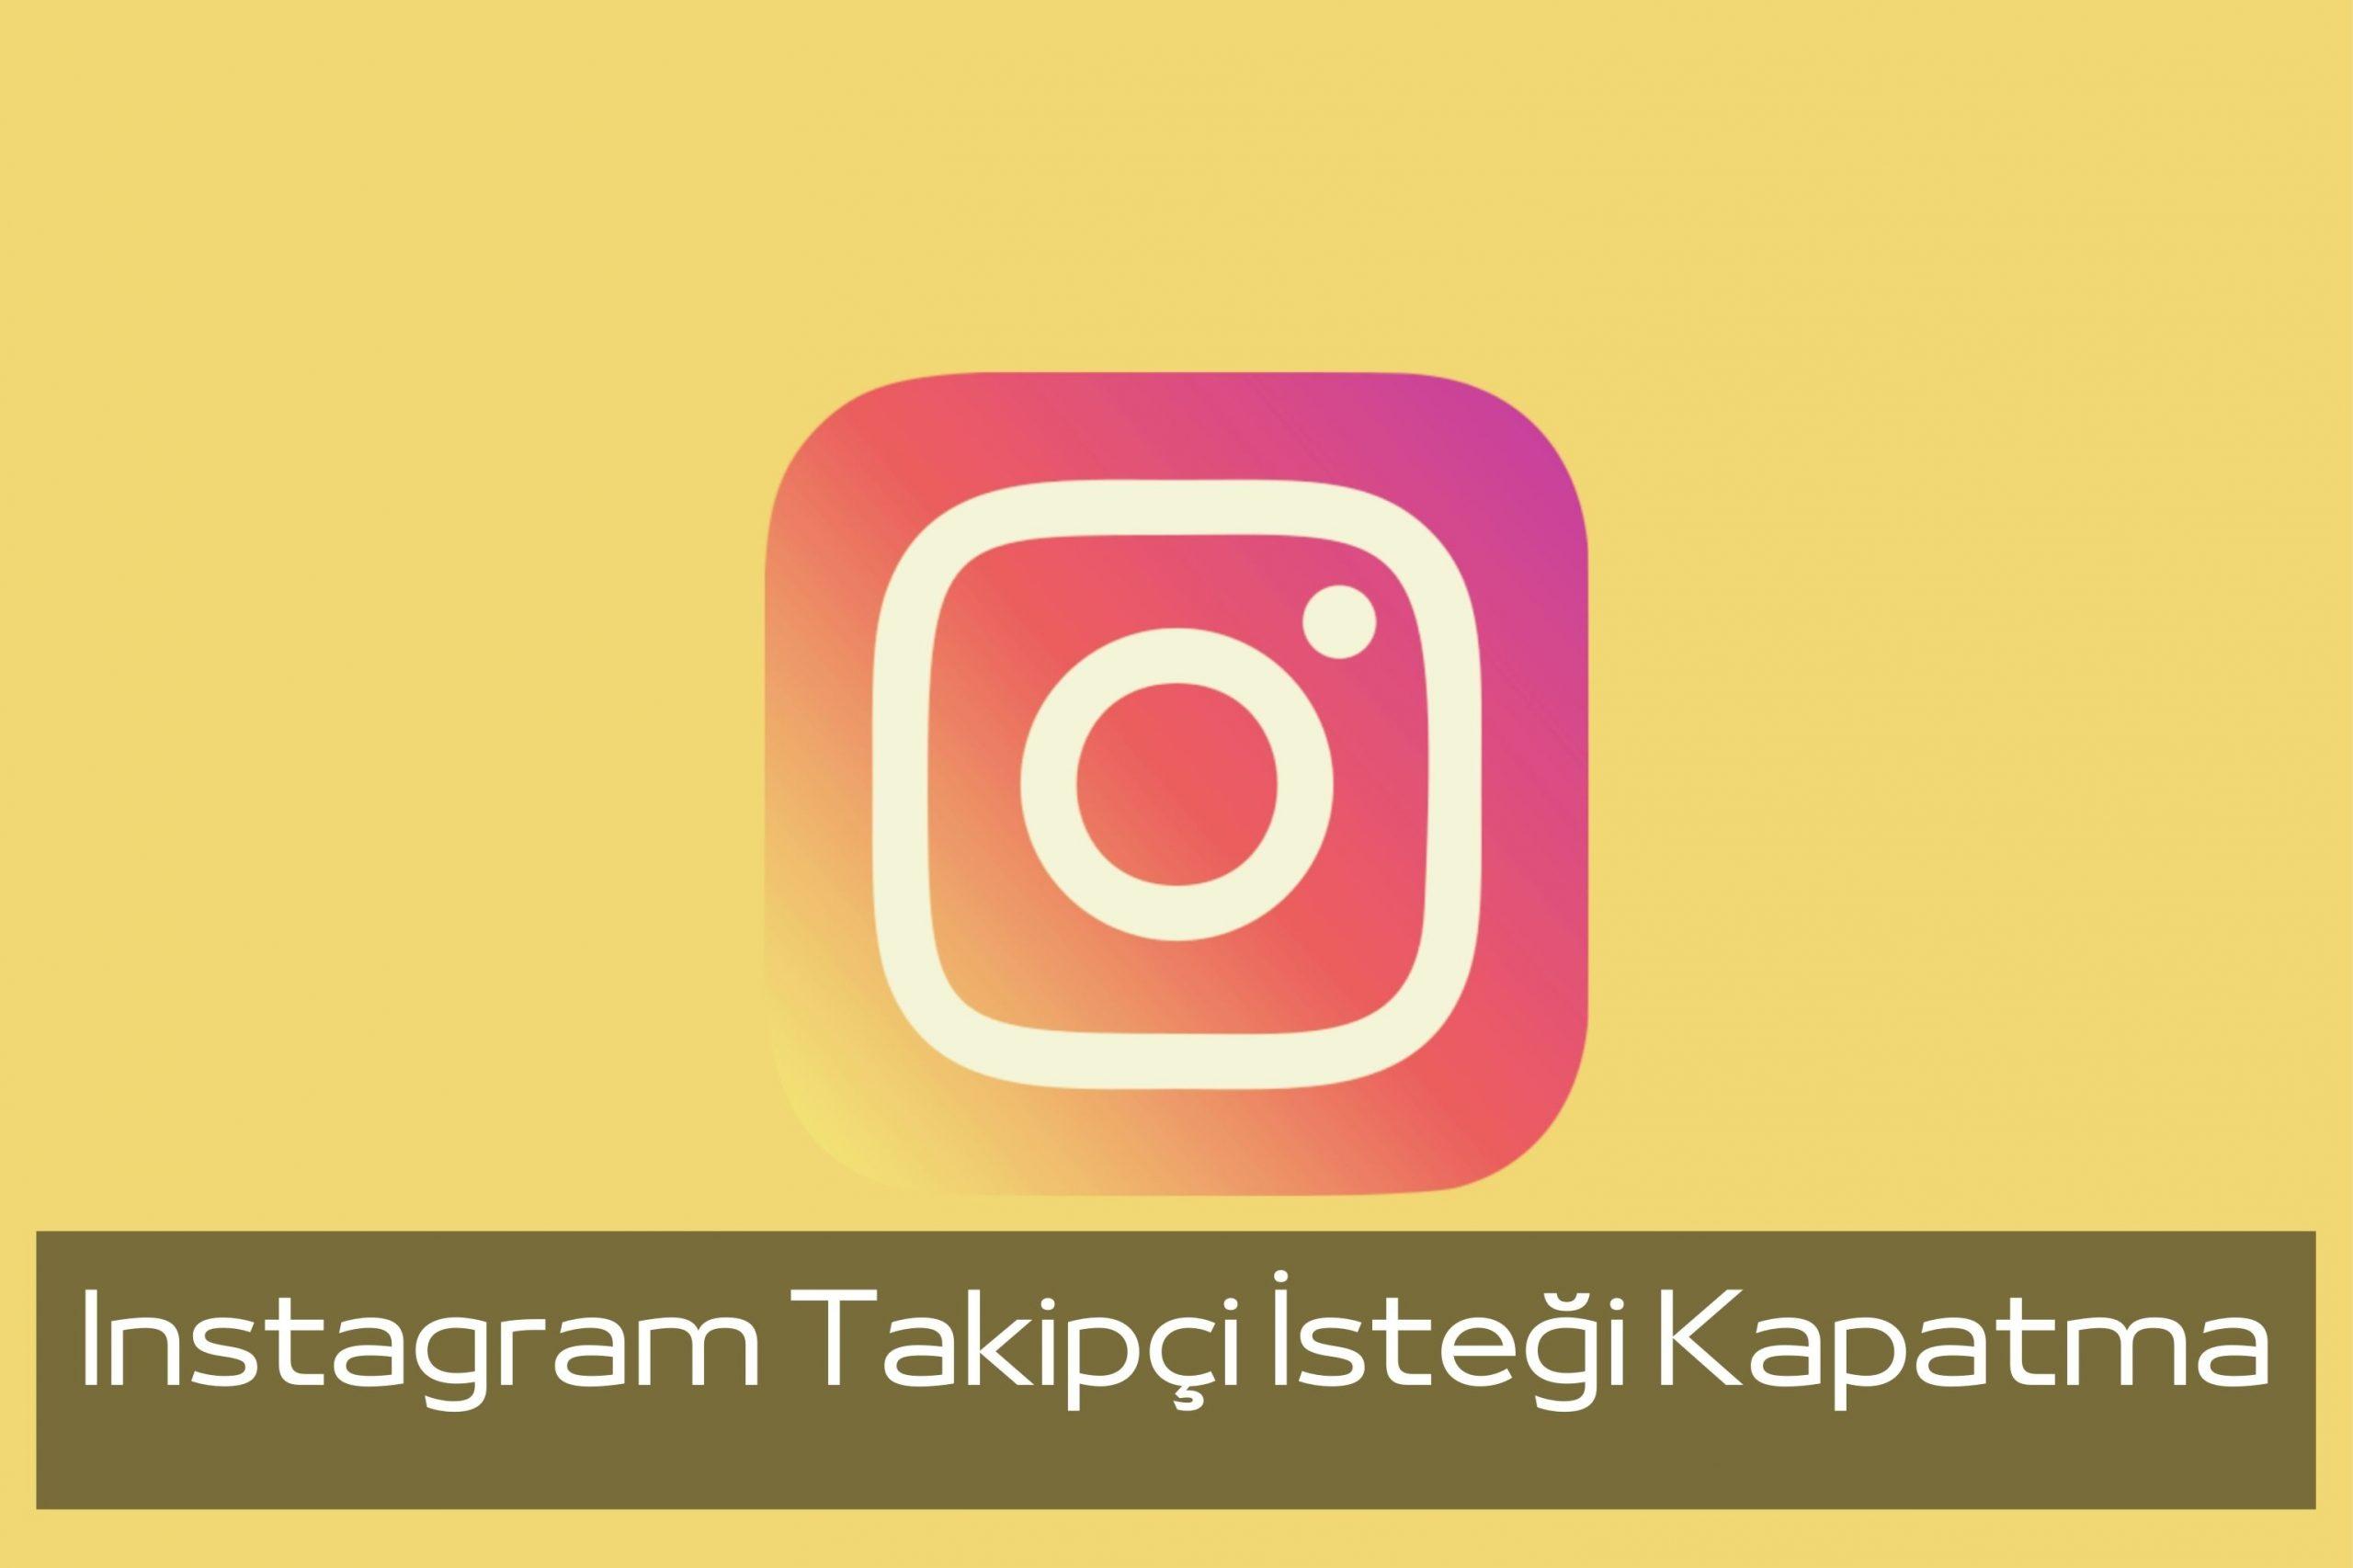 Instagram Takipçi İsteği Kapatma